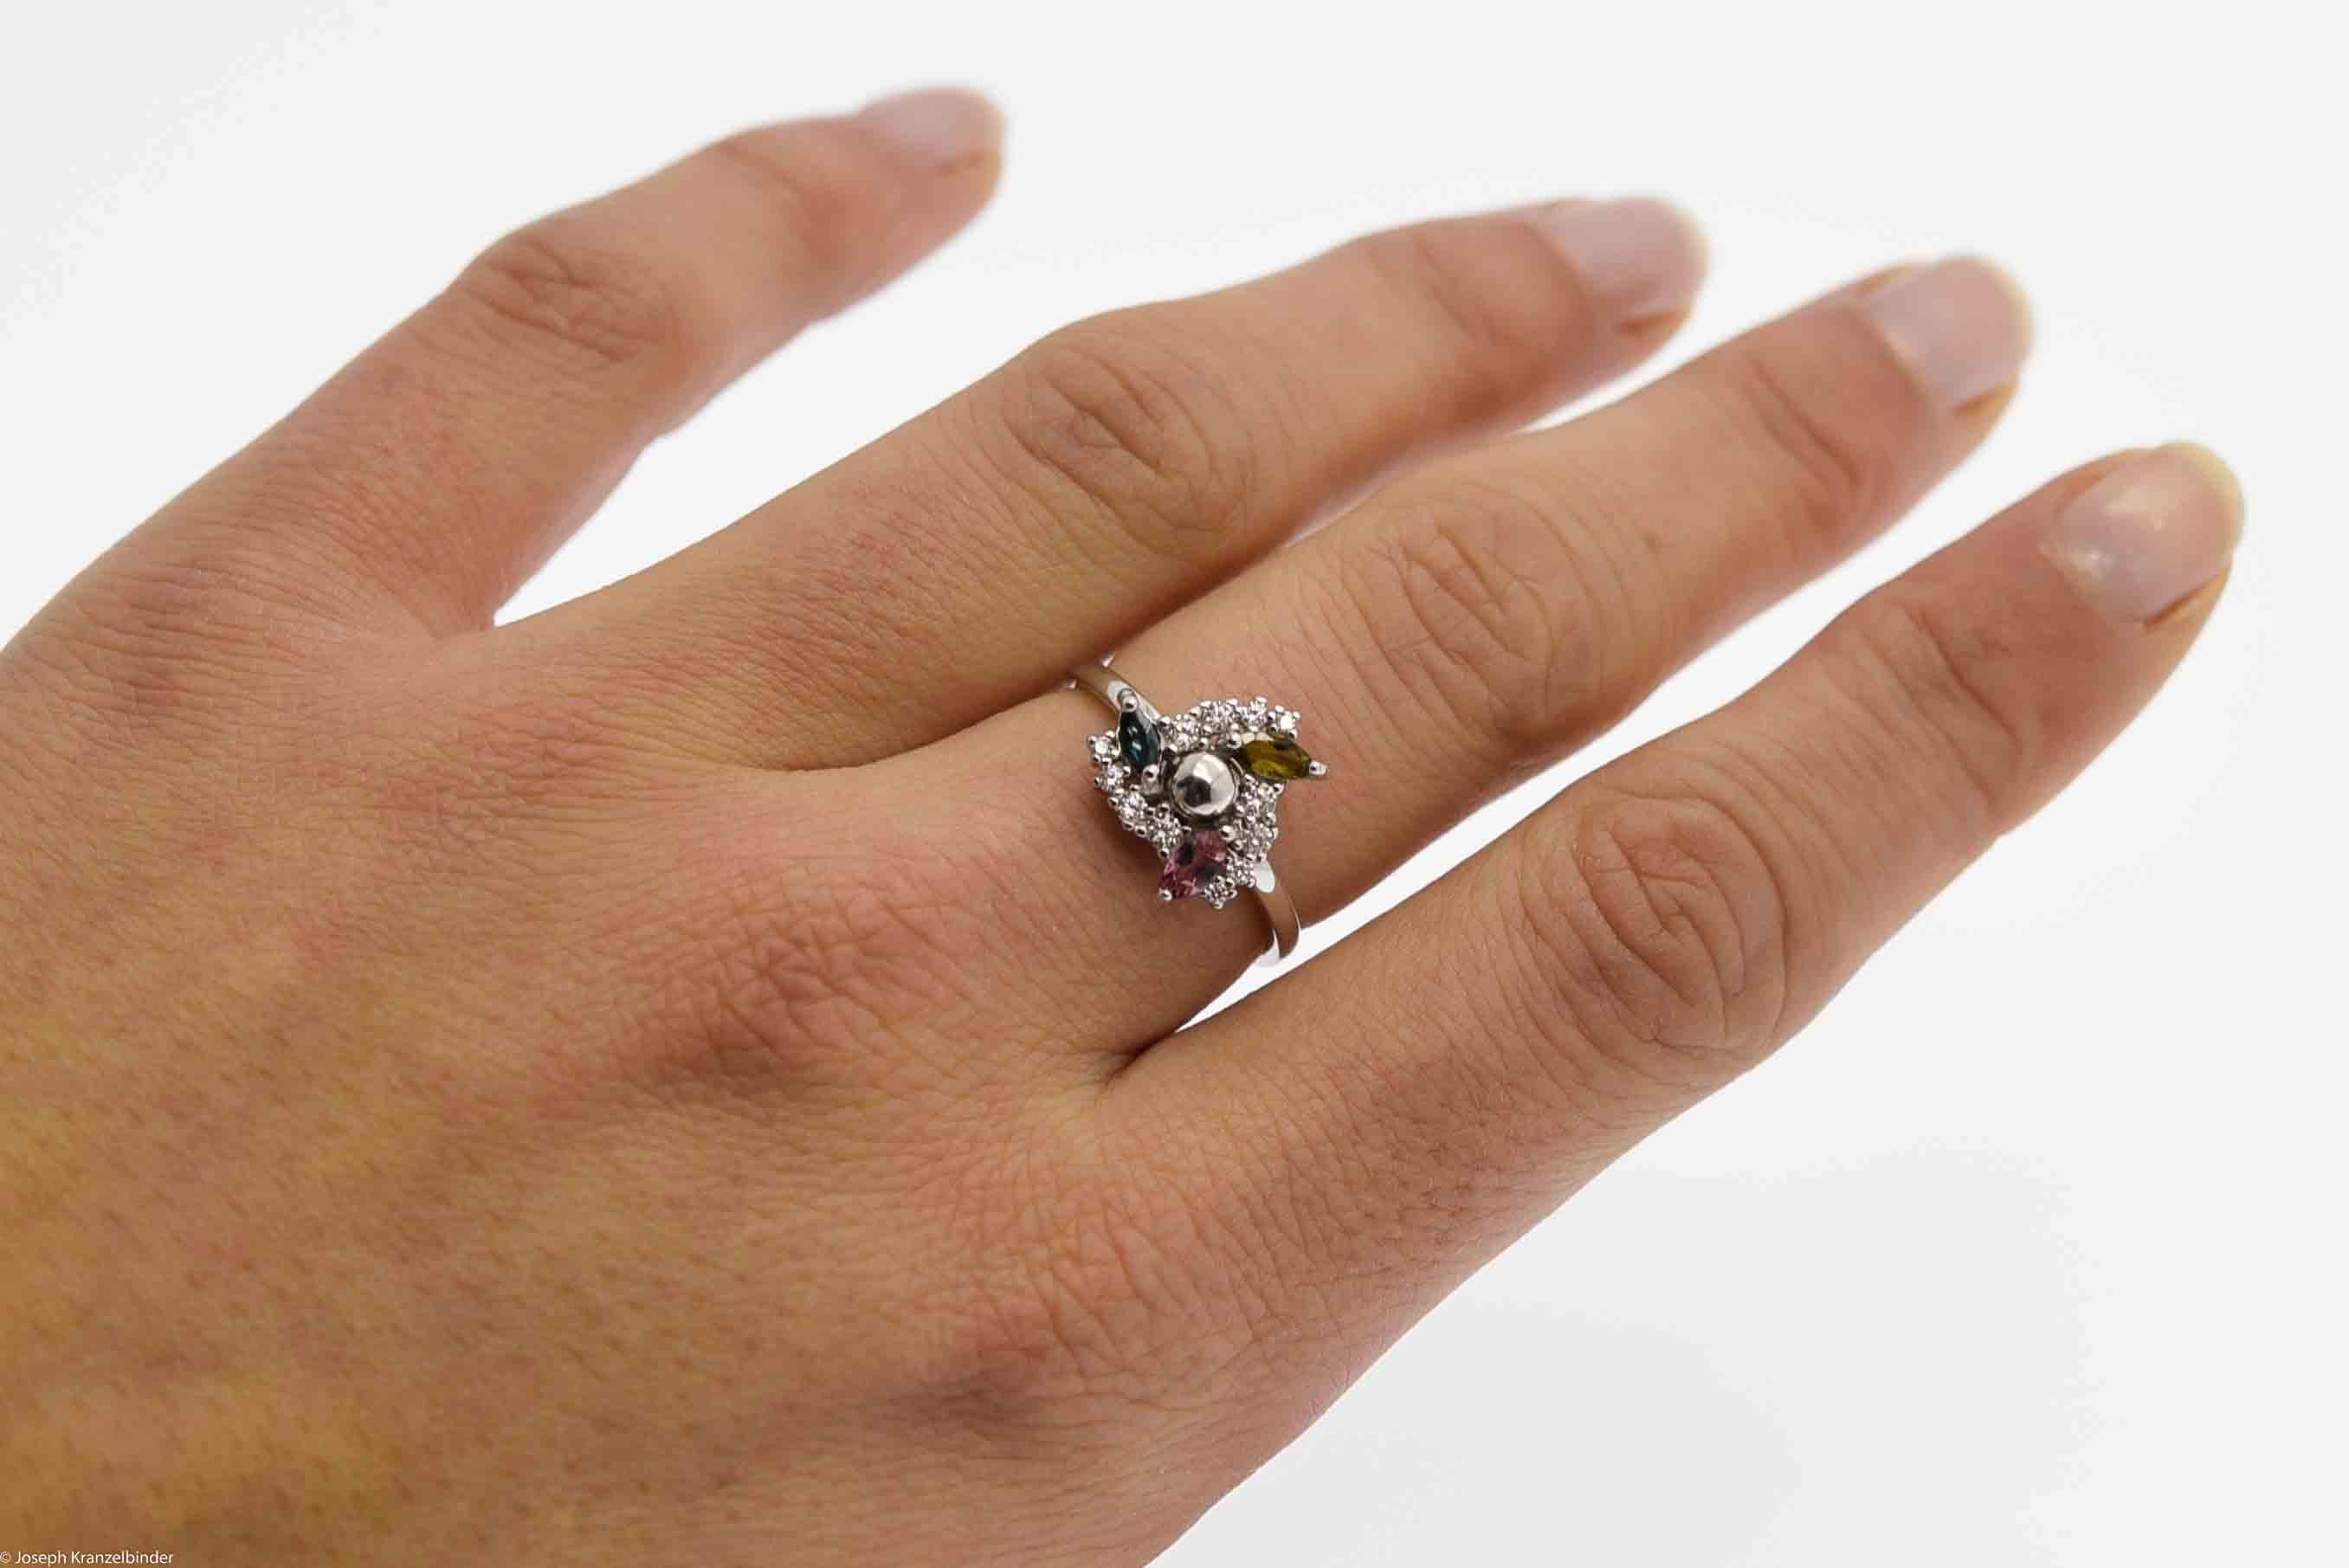 Glitterspinner Ring of Courage